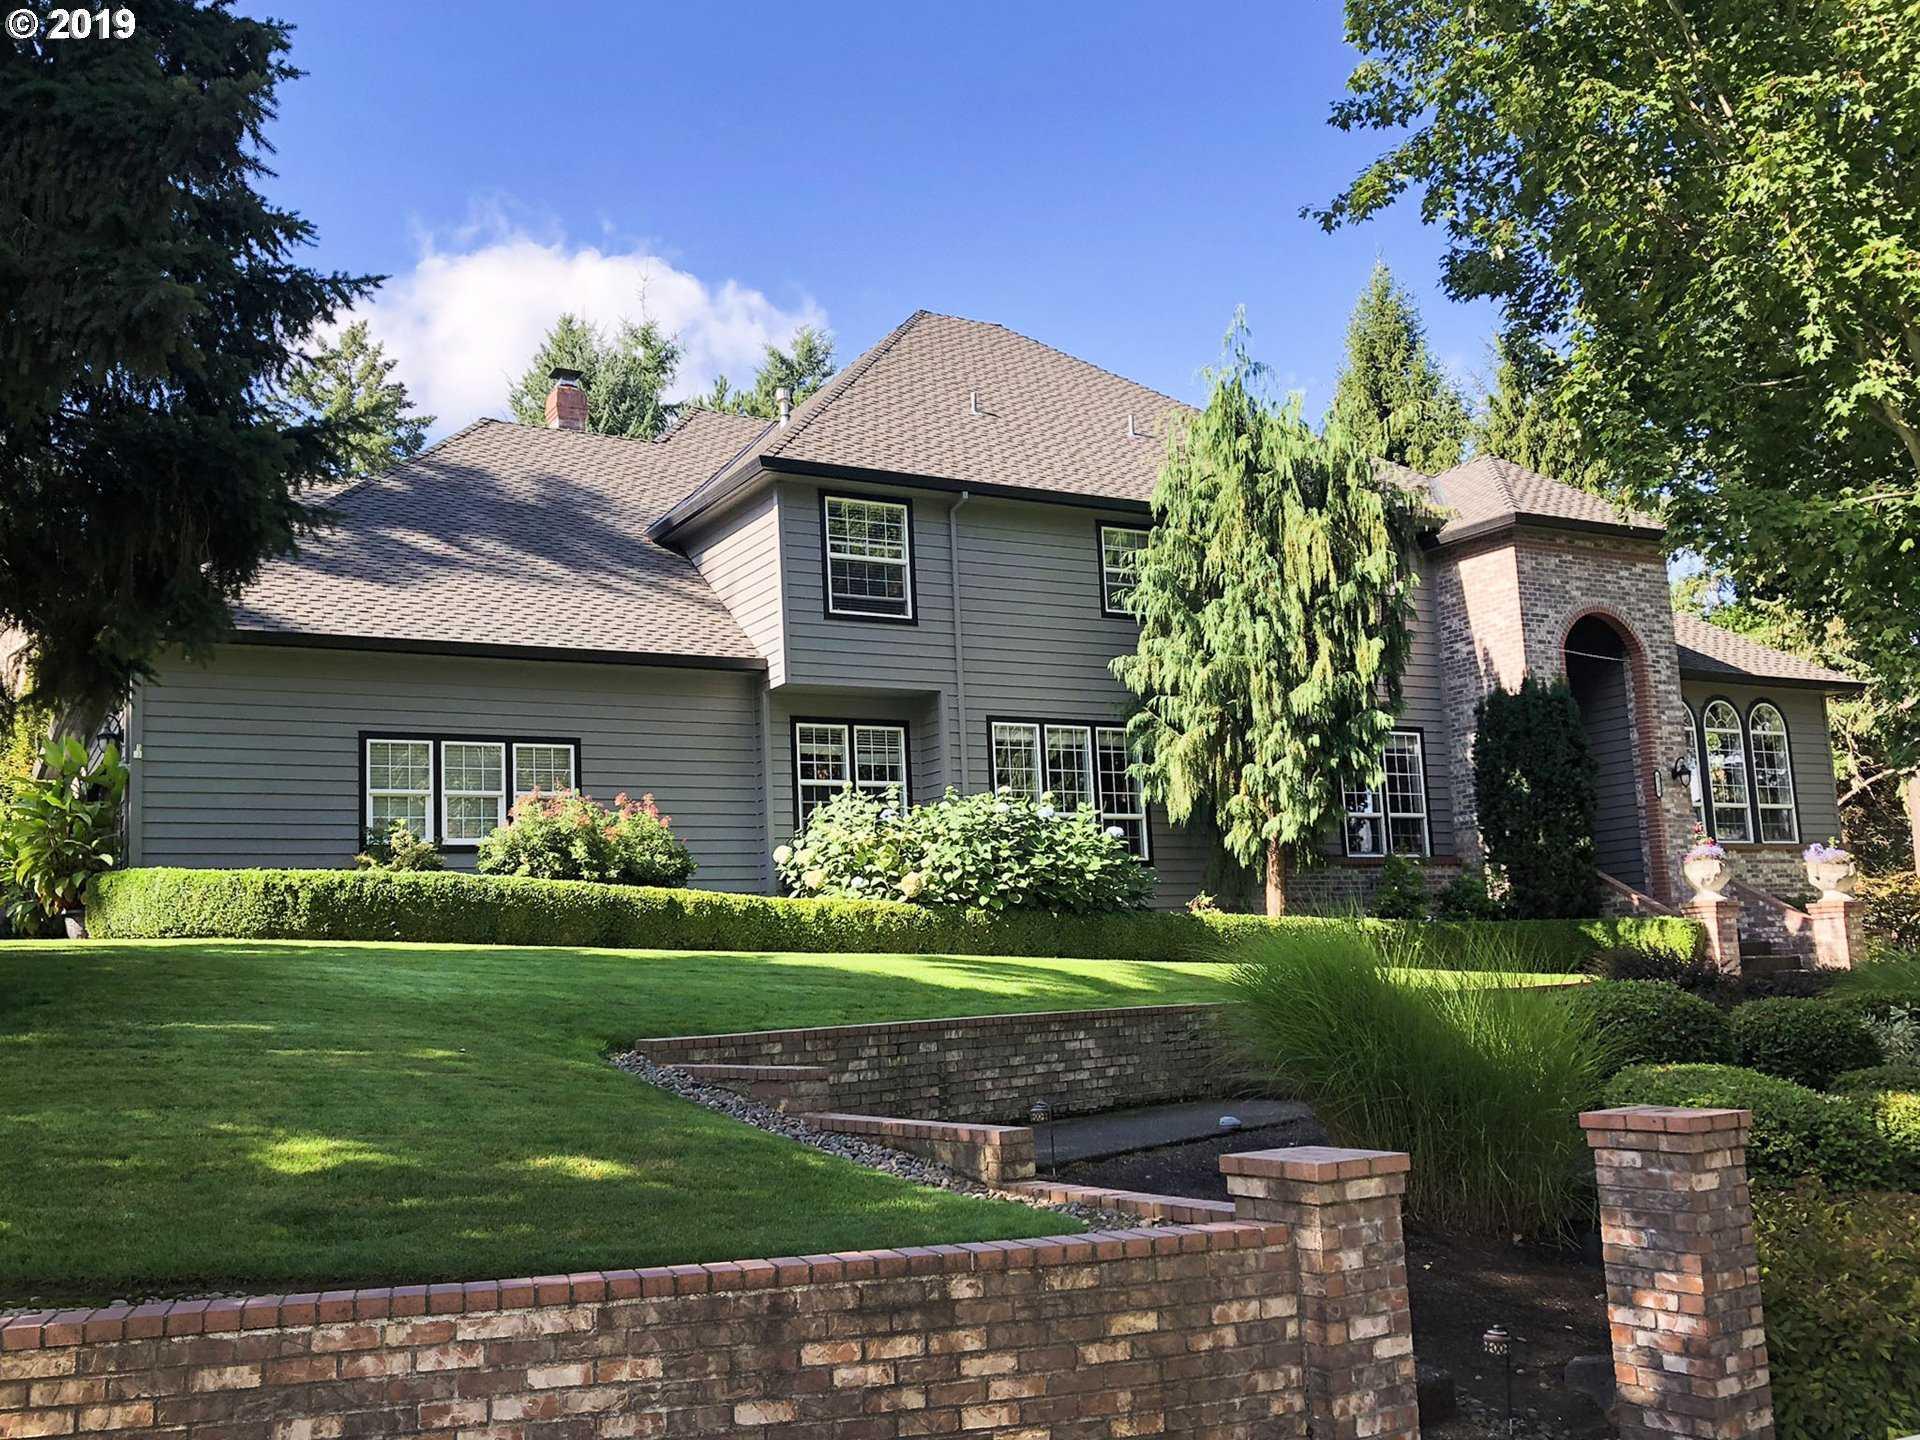 $939,000 - 4Br/5Ba -  for Sale in Conifer Ridge, Beaverton